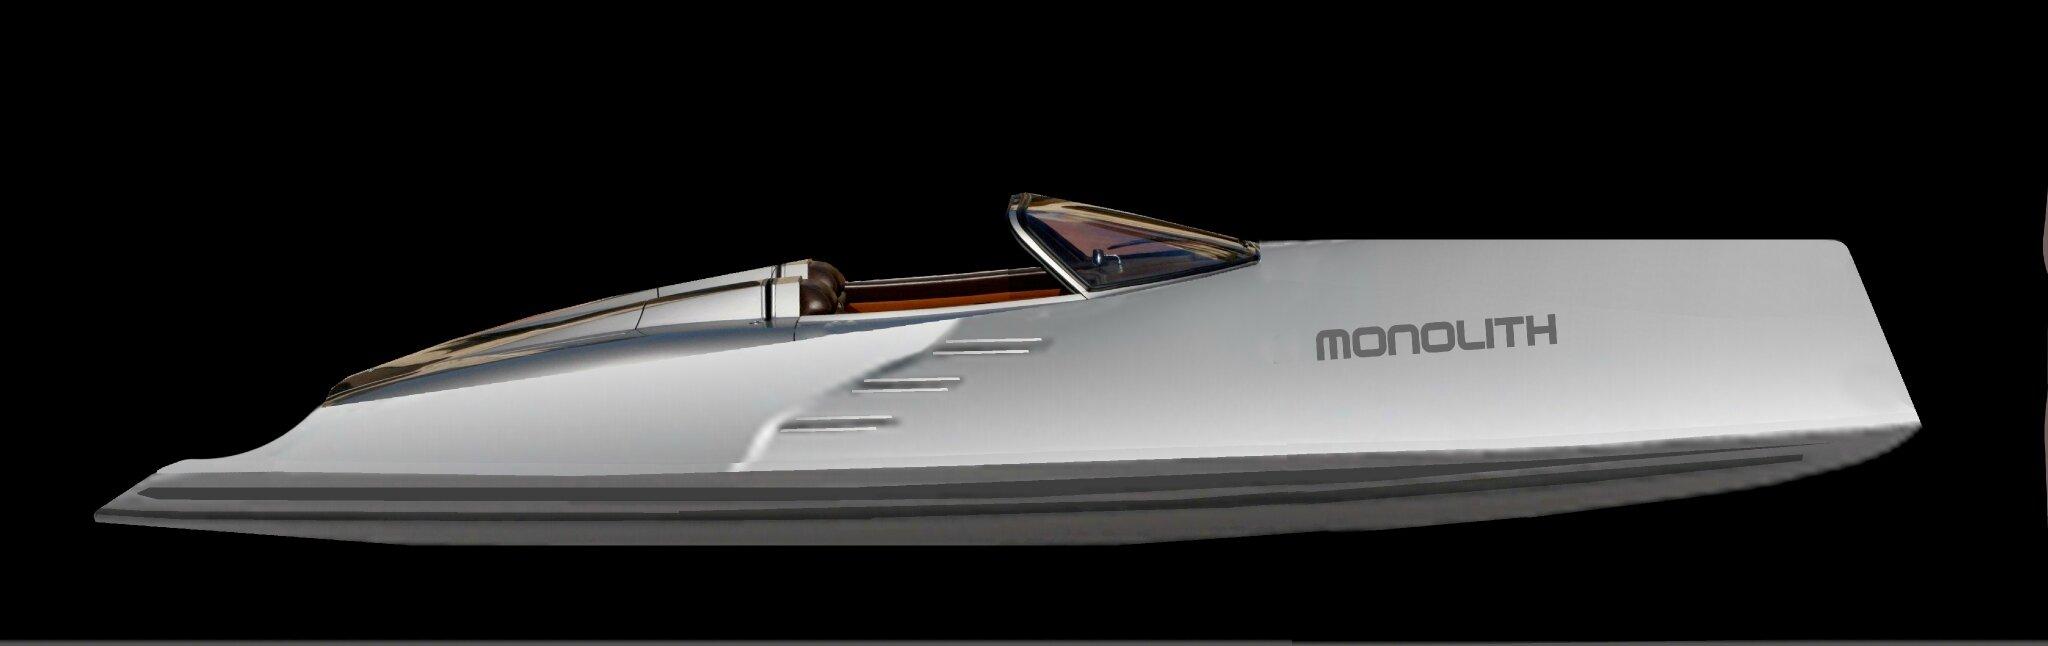 Superyacht design concept,Superyacht,conceptual boat,conceptual yacht,conceptual motorboat,dream boat design,dream boat,dream motorboat,dream yacht,architectes navals,miami Boat Show,decatoire,,Motoryacht design,